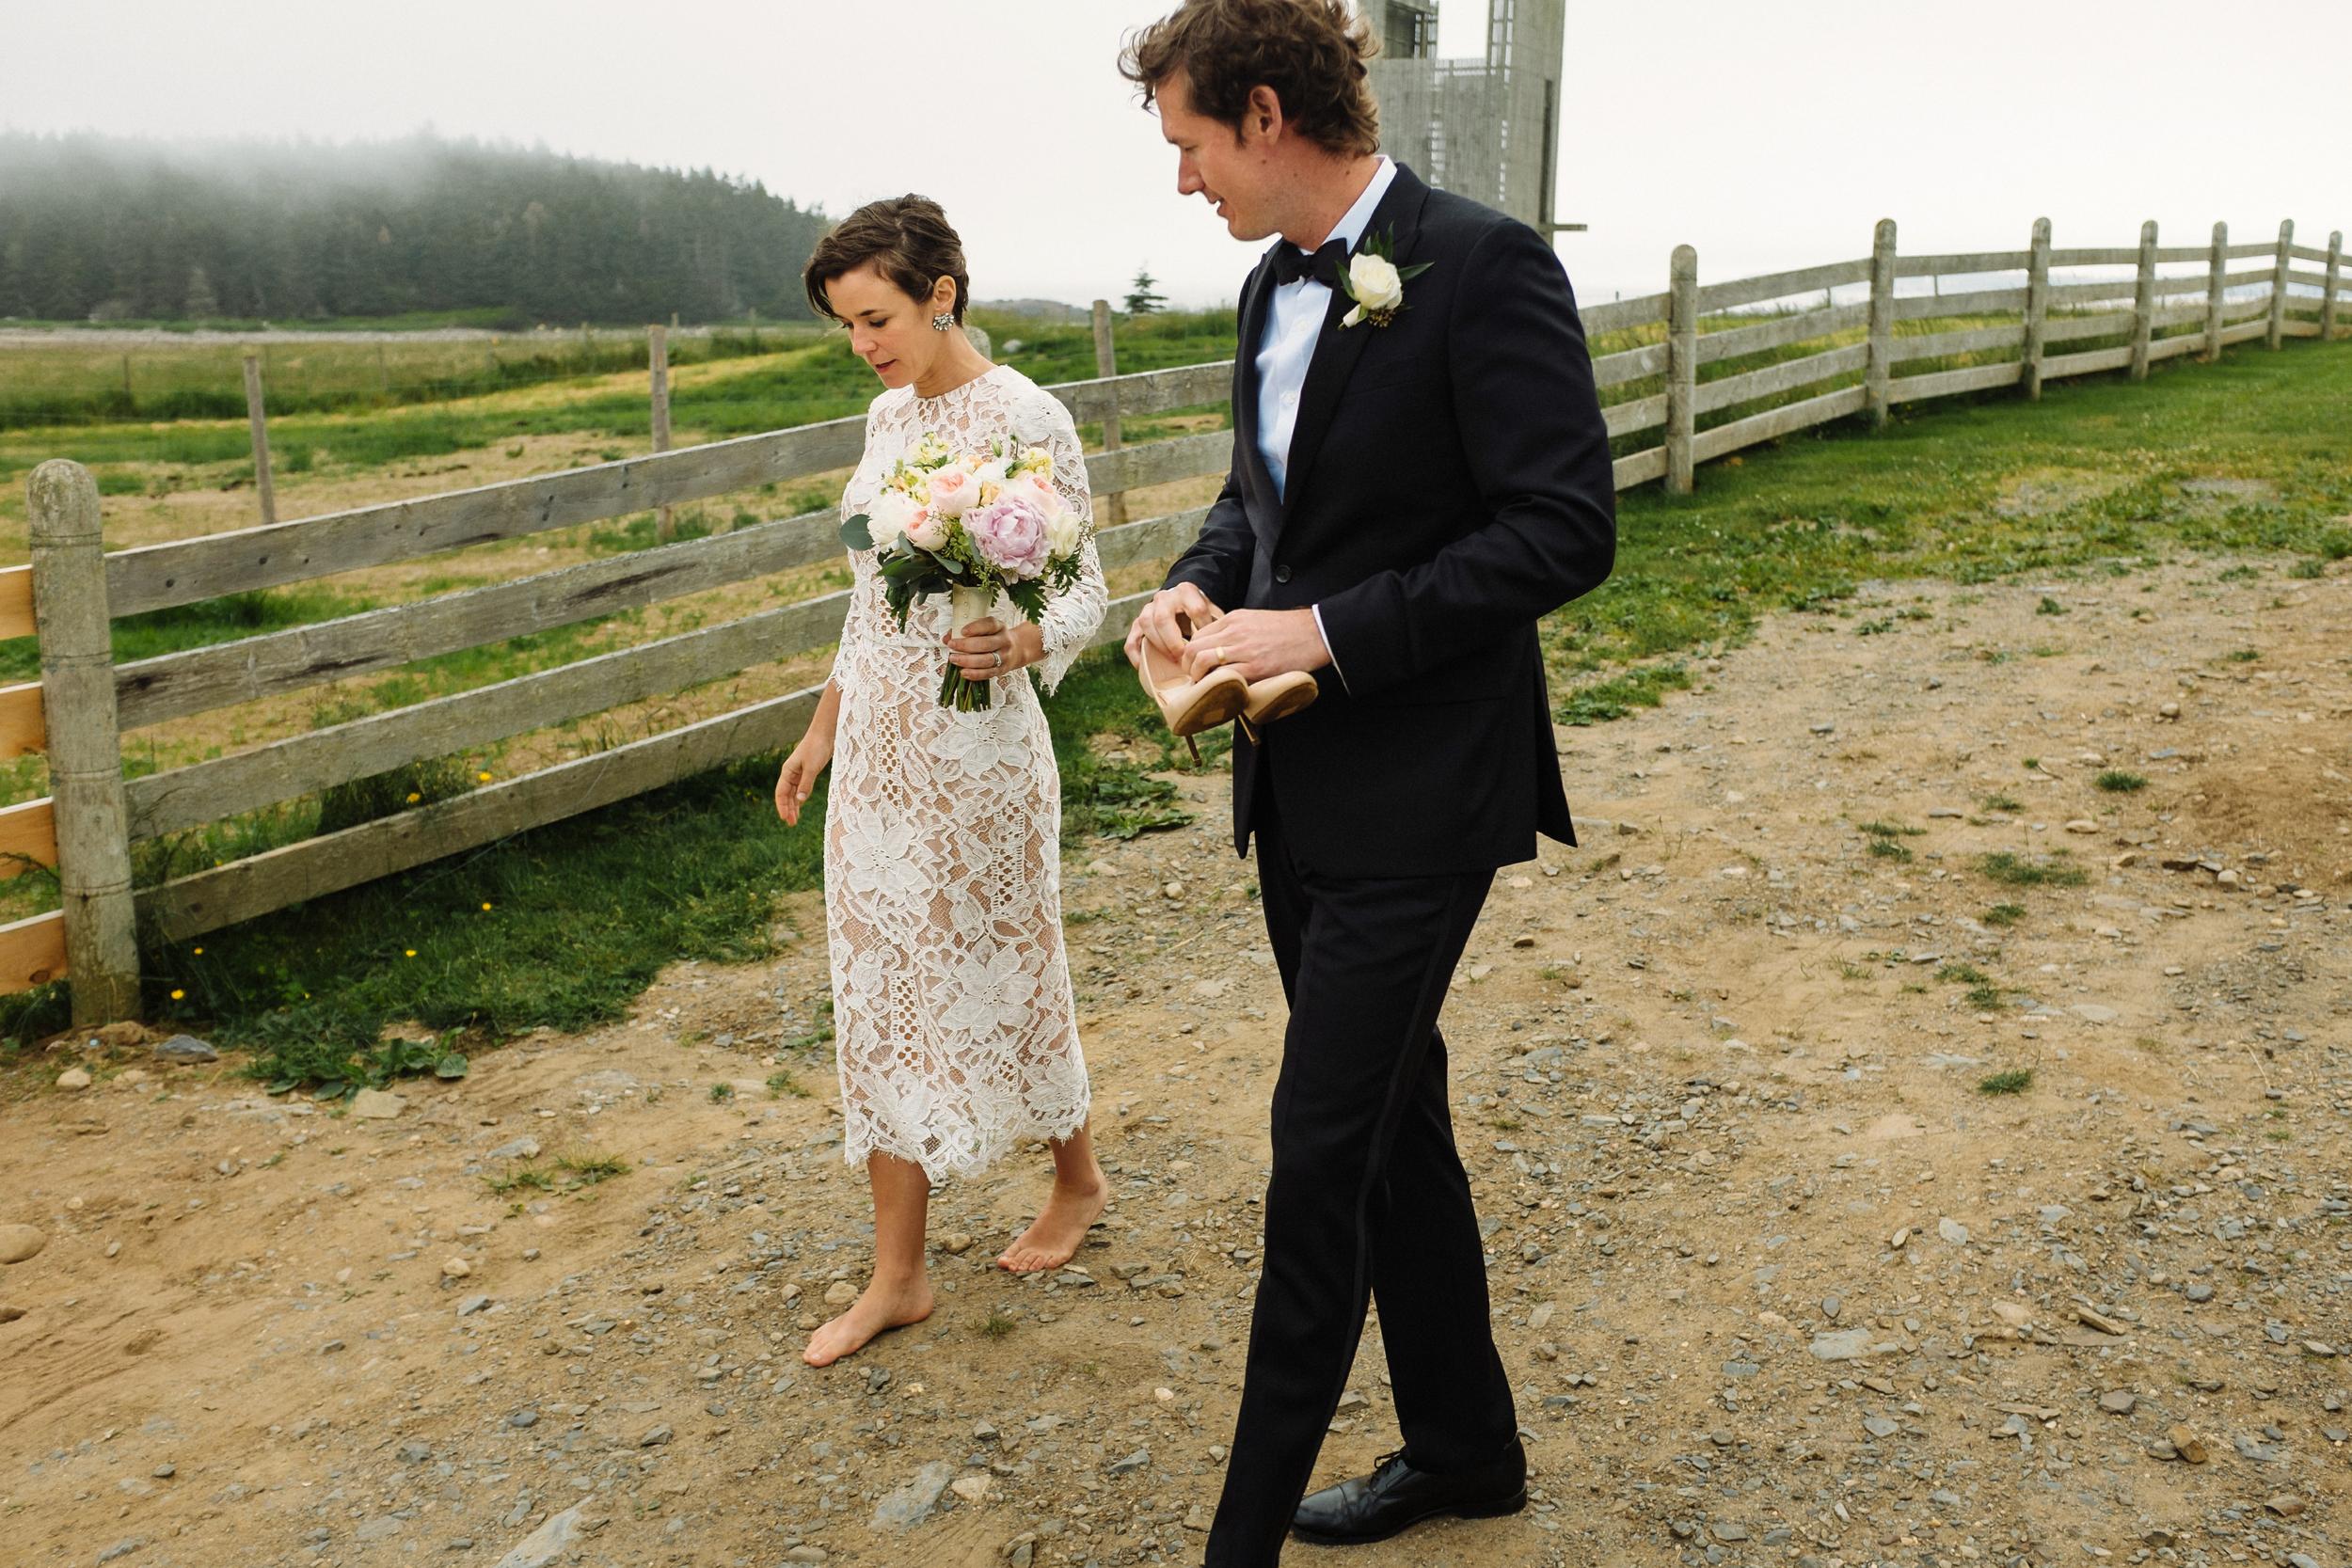 lunenberg bride and groom wedding portraits.jpg